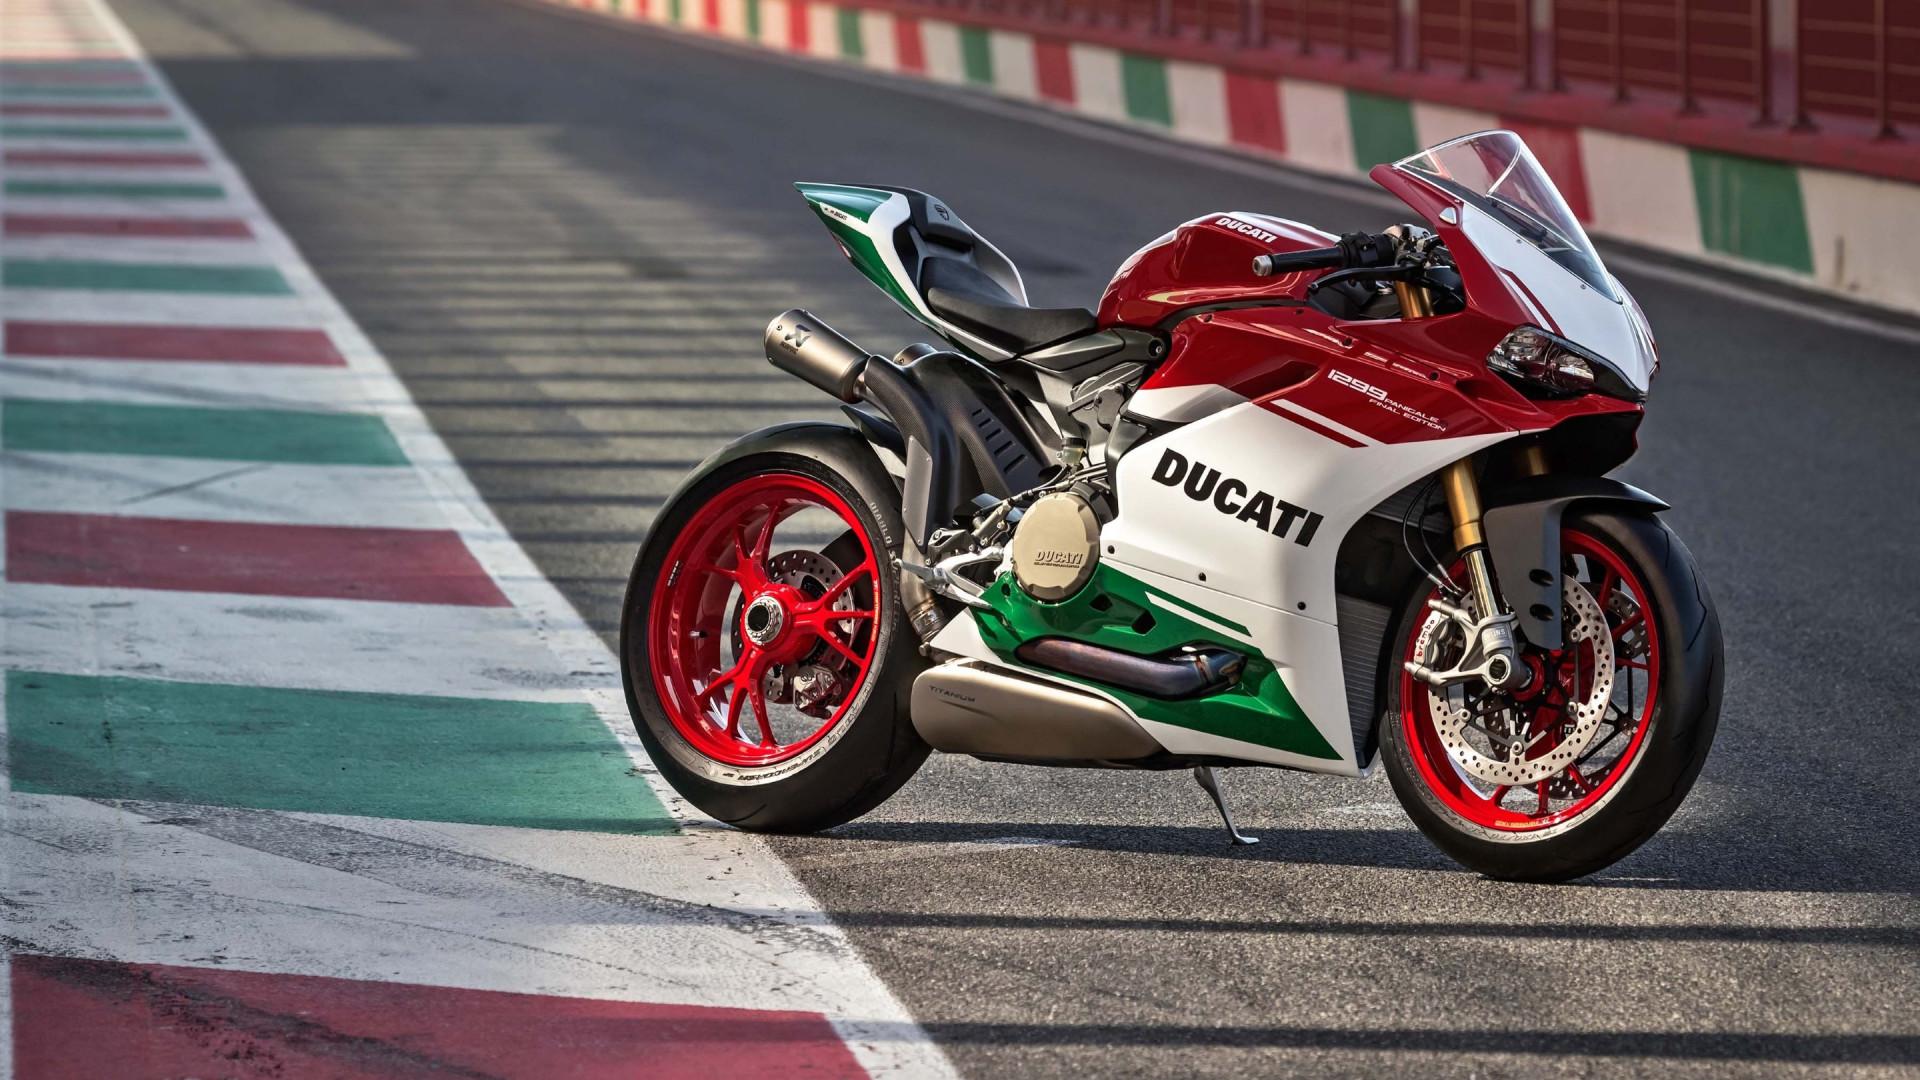 Download wallpaper Ducati 1299 Panigale R 1920x1080 1920x1080